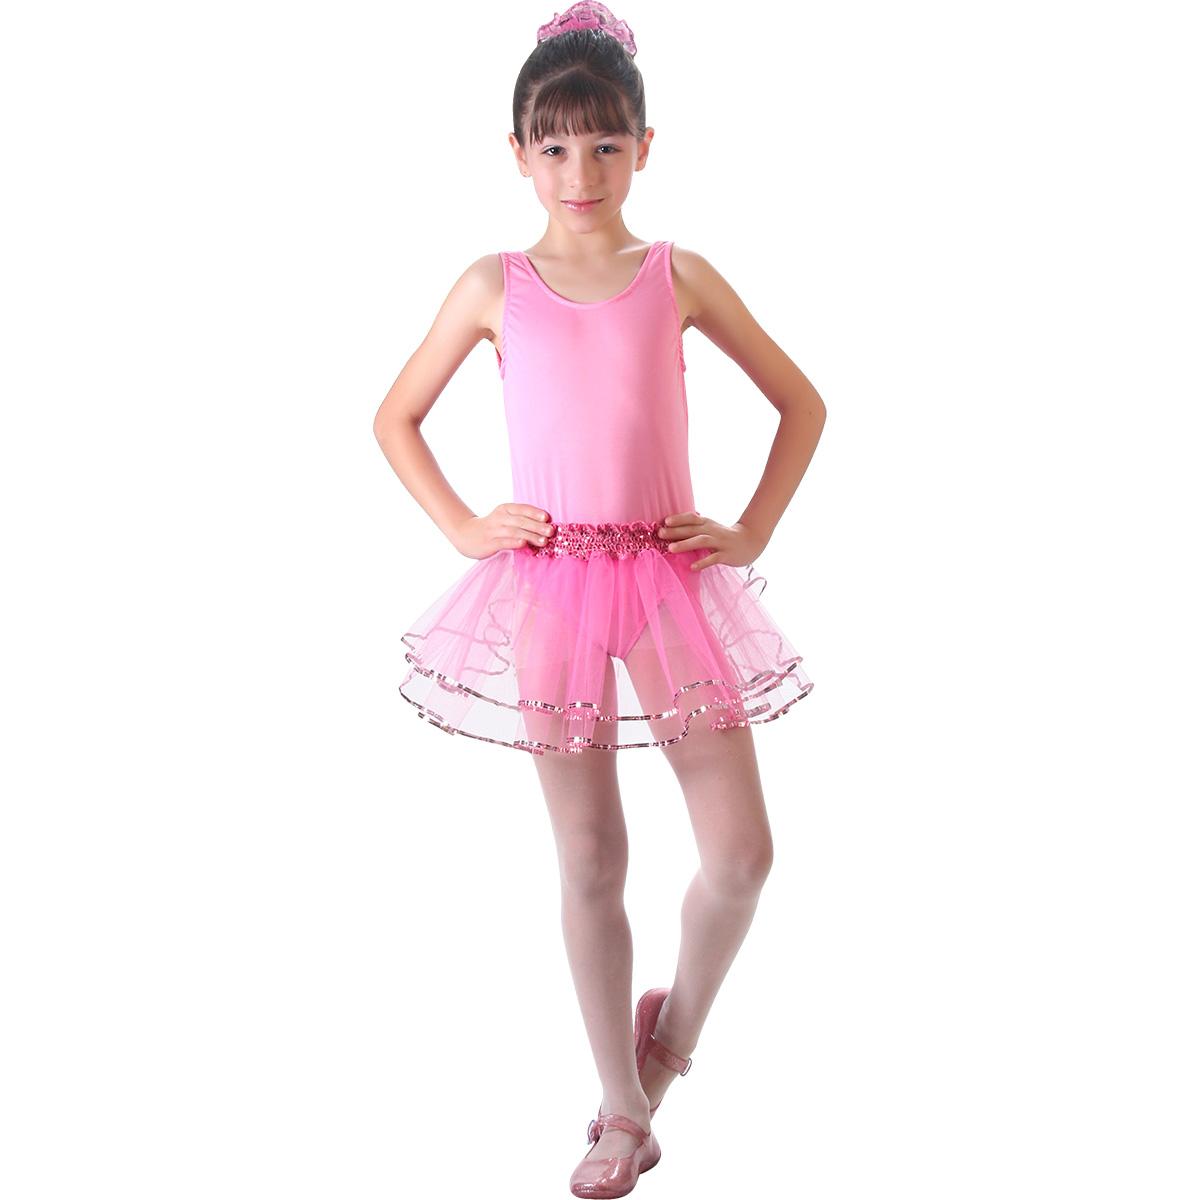 2baf50ca34 Fantasia Bailarina Basic